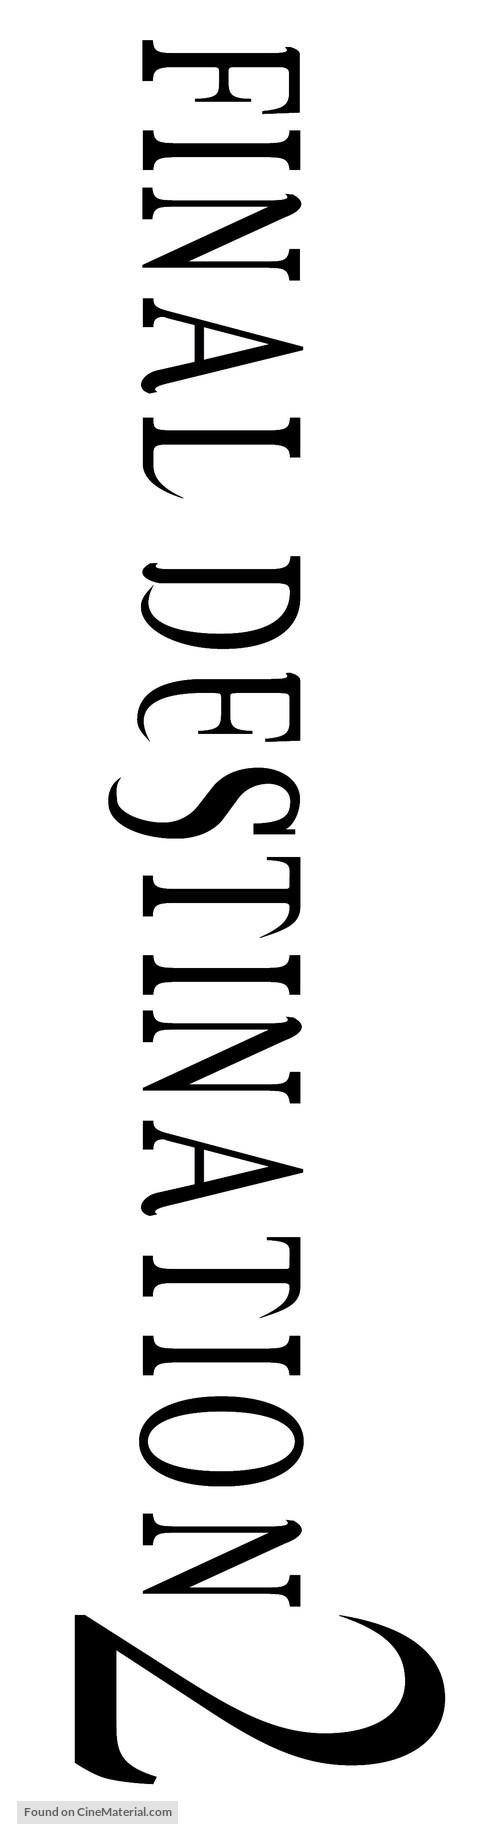 Final Destination 2 - Logo